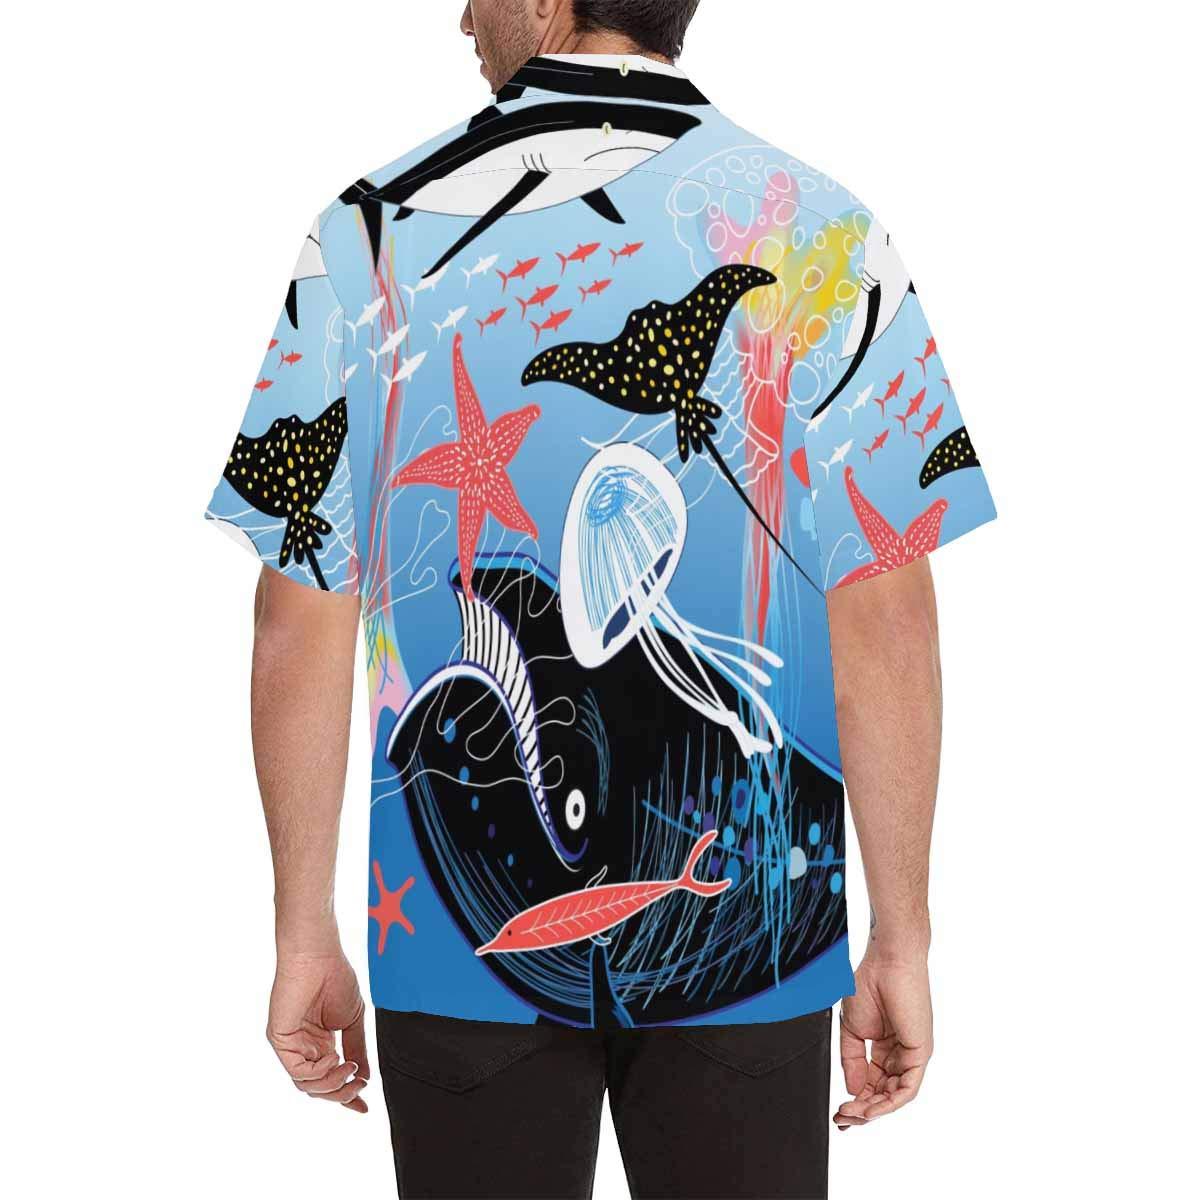 InterestPrint Mens Man Flying with Balloon Lights Tees Tops T-Shirts